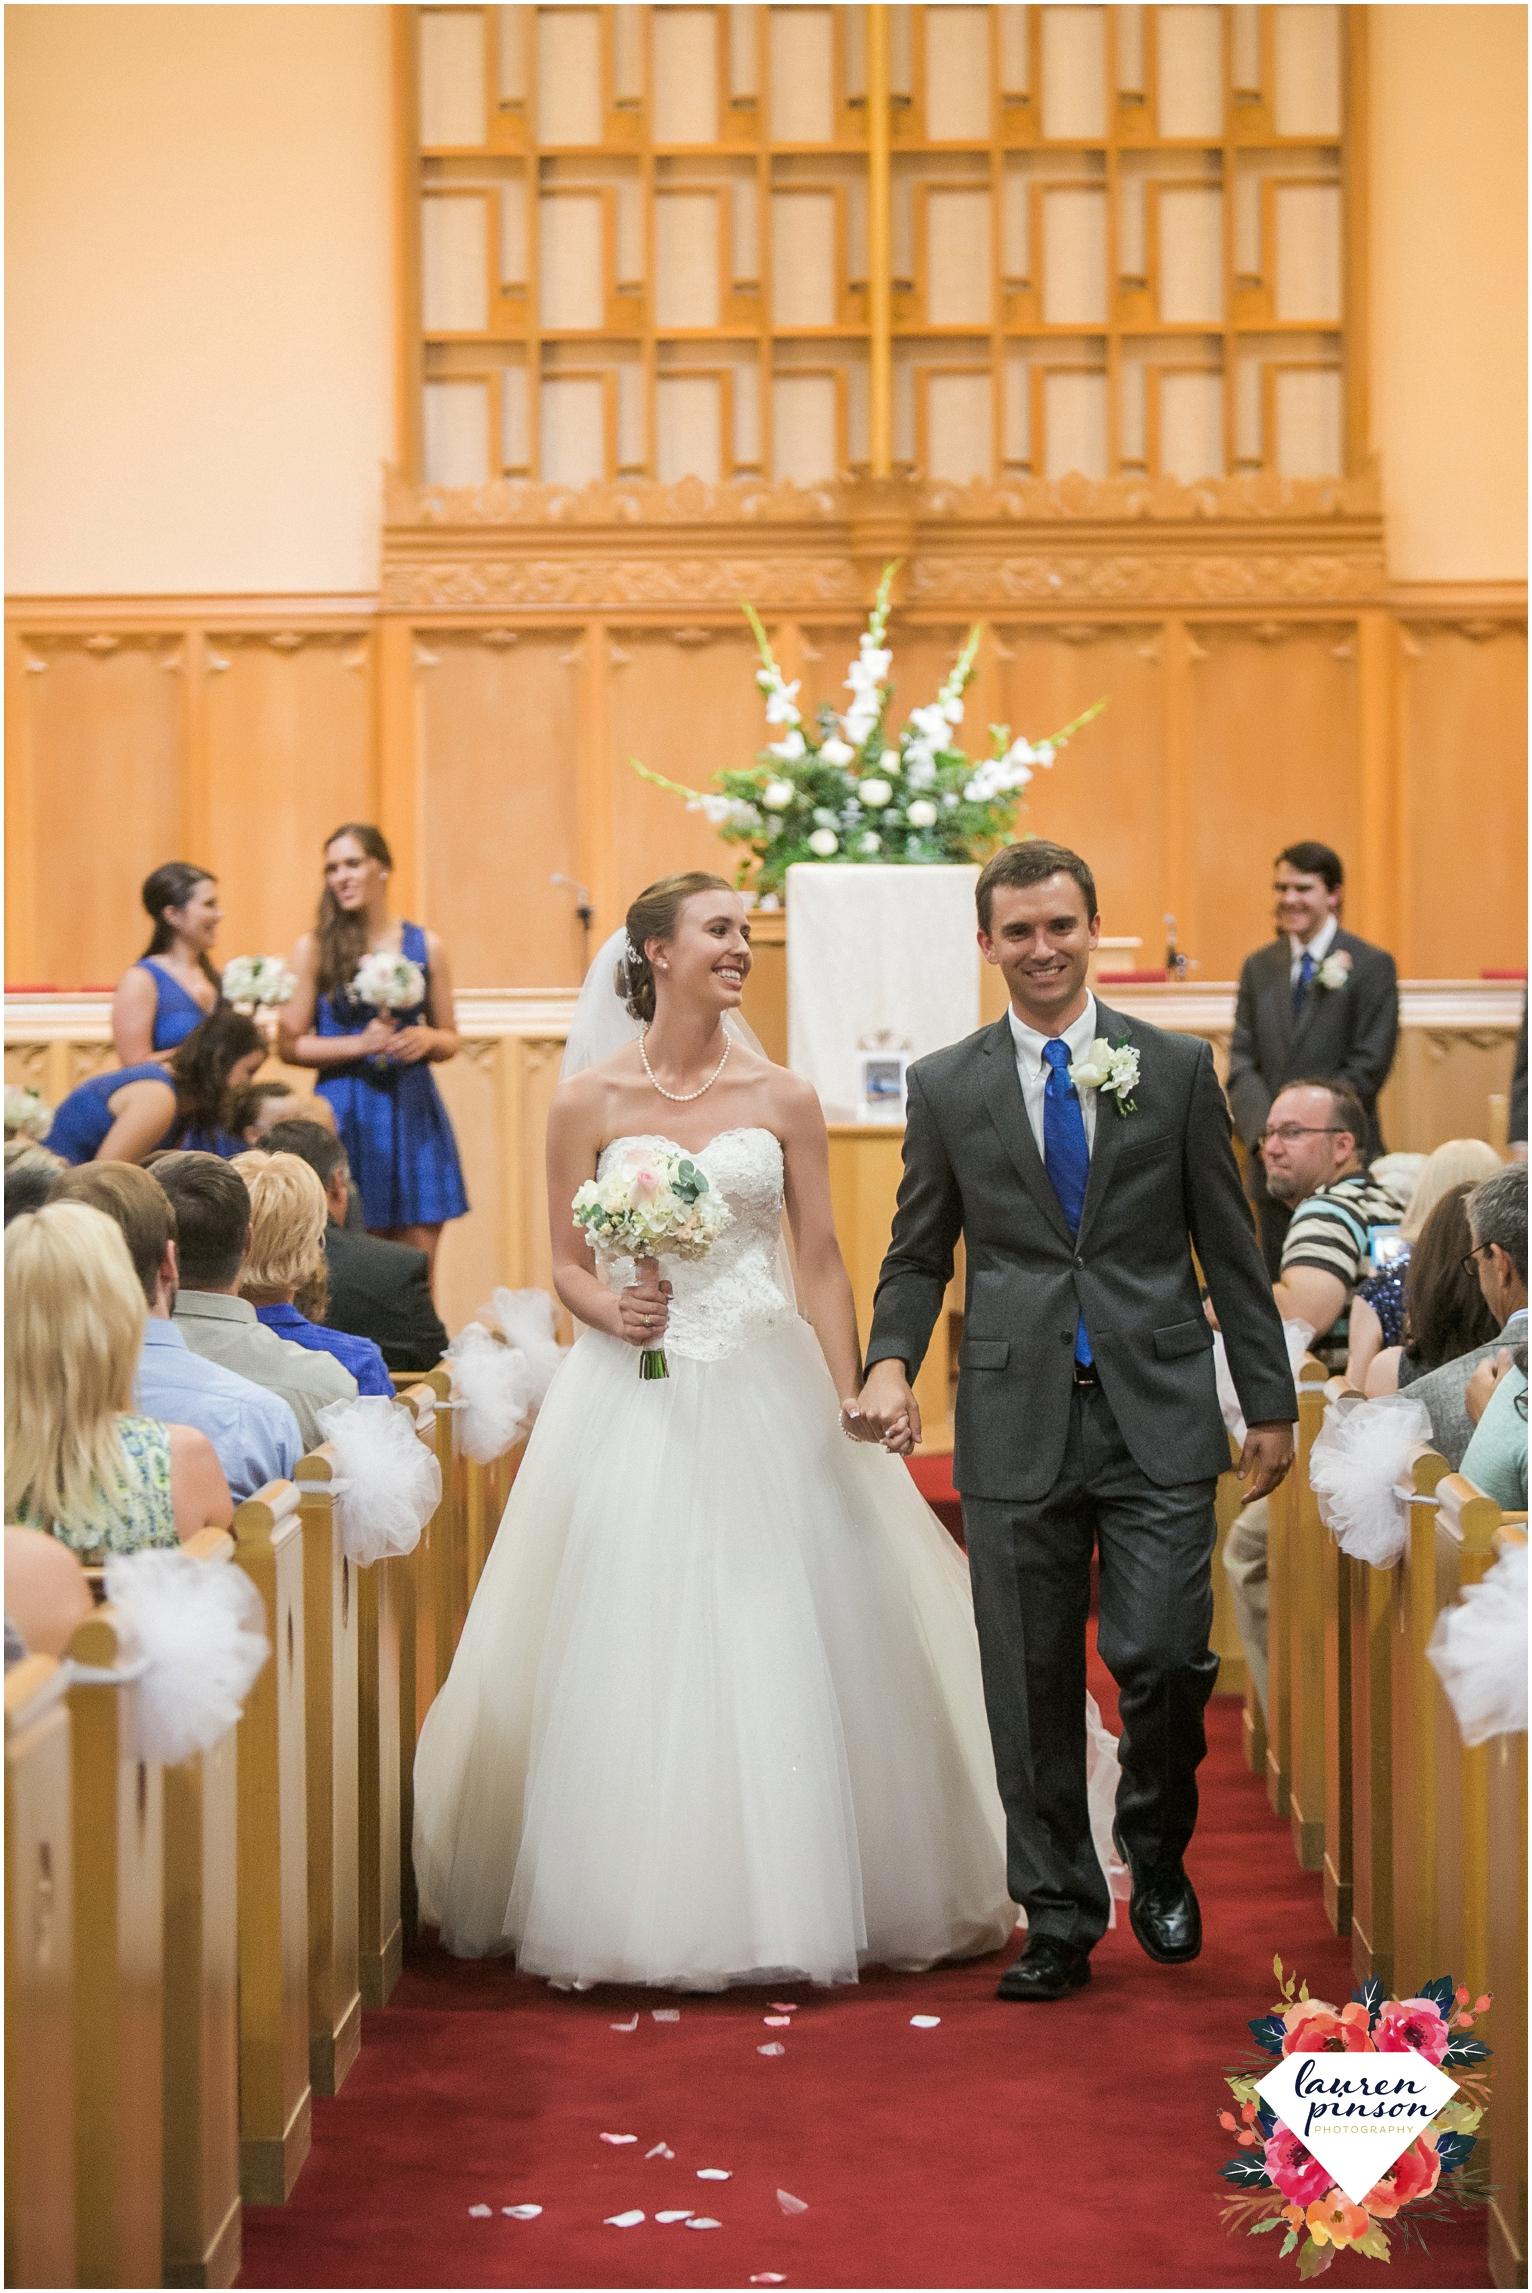 wichita-falls-wedding-photography-at-fain-presbyterian-church-and-the-wellington-timeless-classic-modern-photographer_1139.jpg